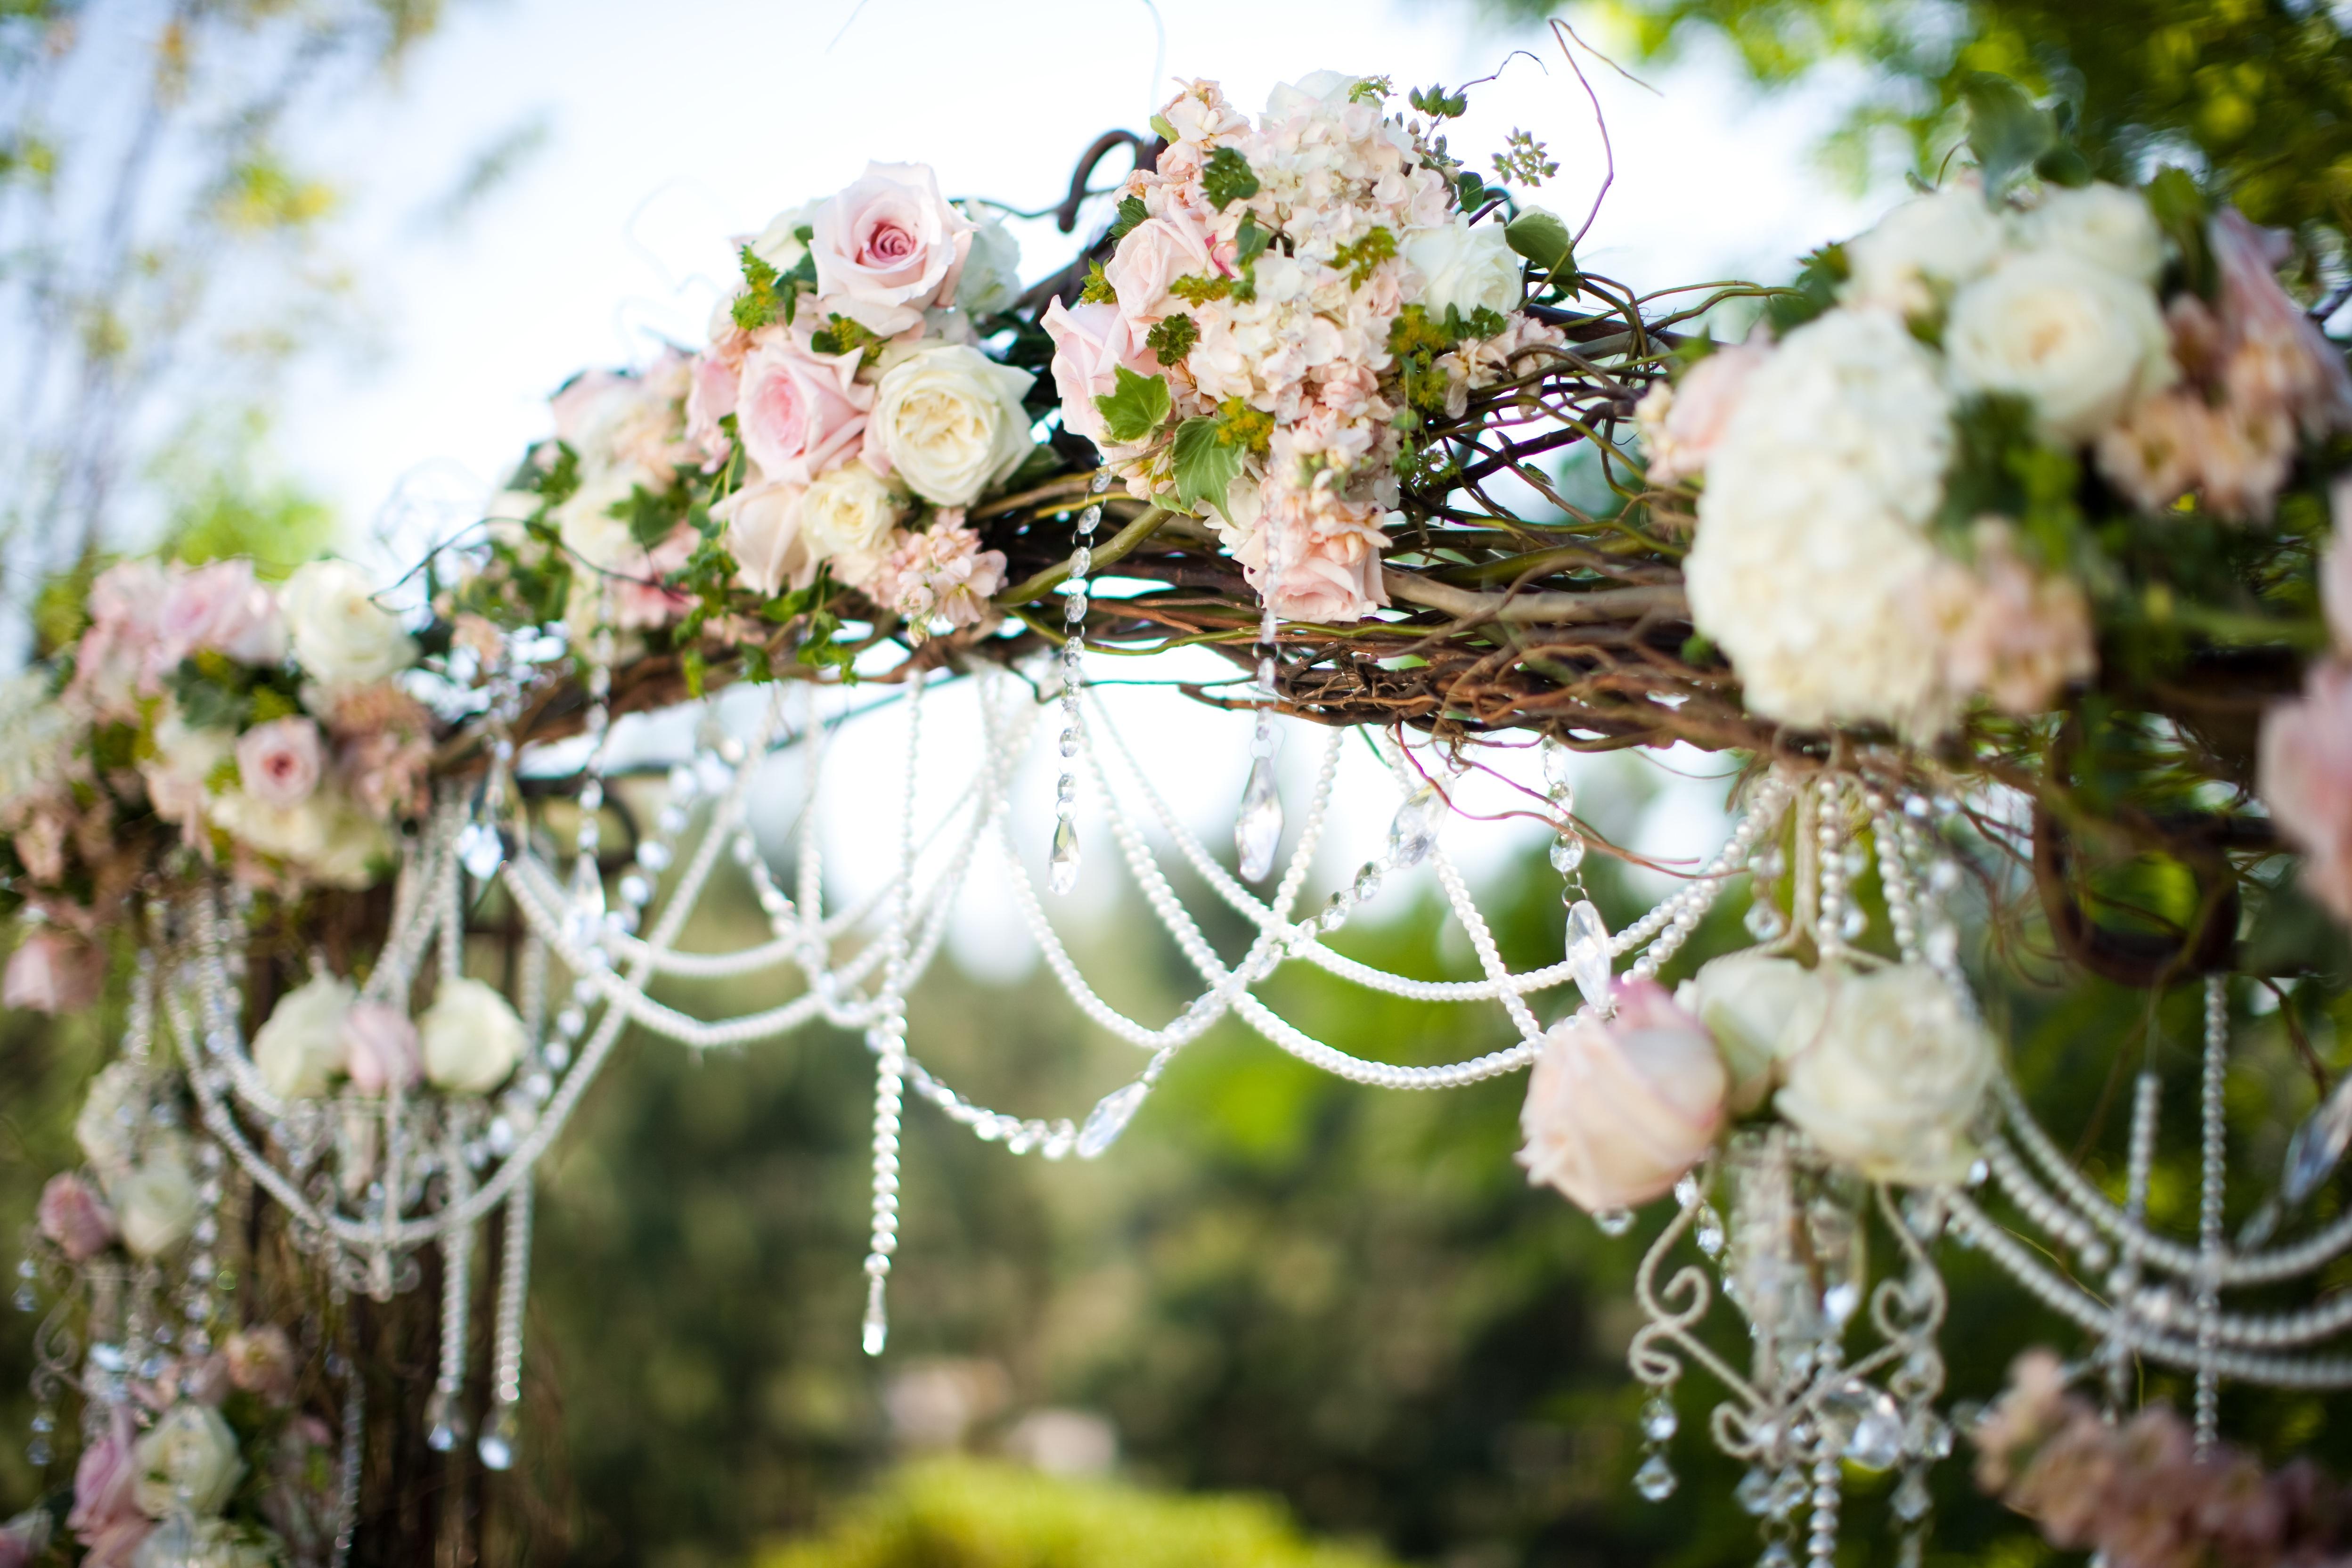 whimsical outdoor wedding décor worldwide homefurnishings inc